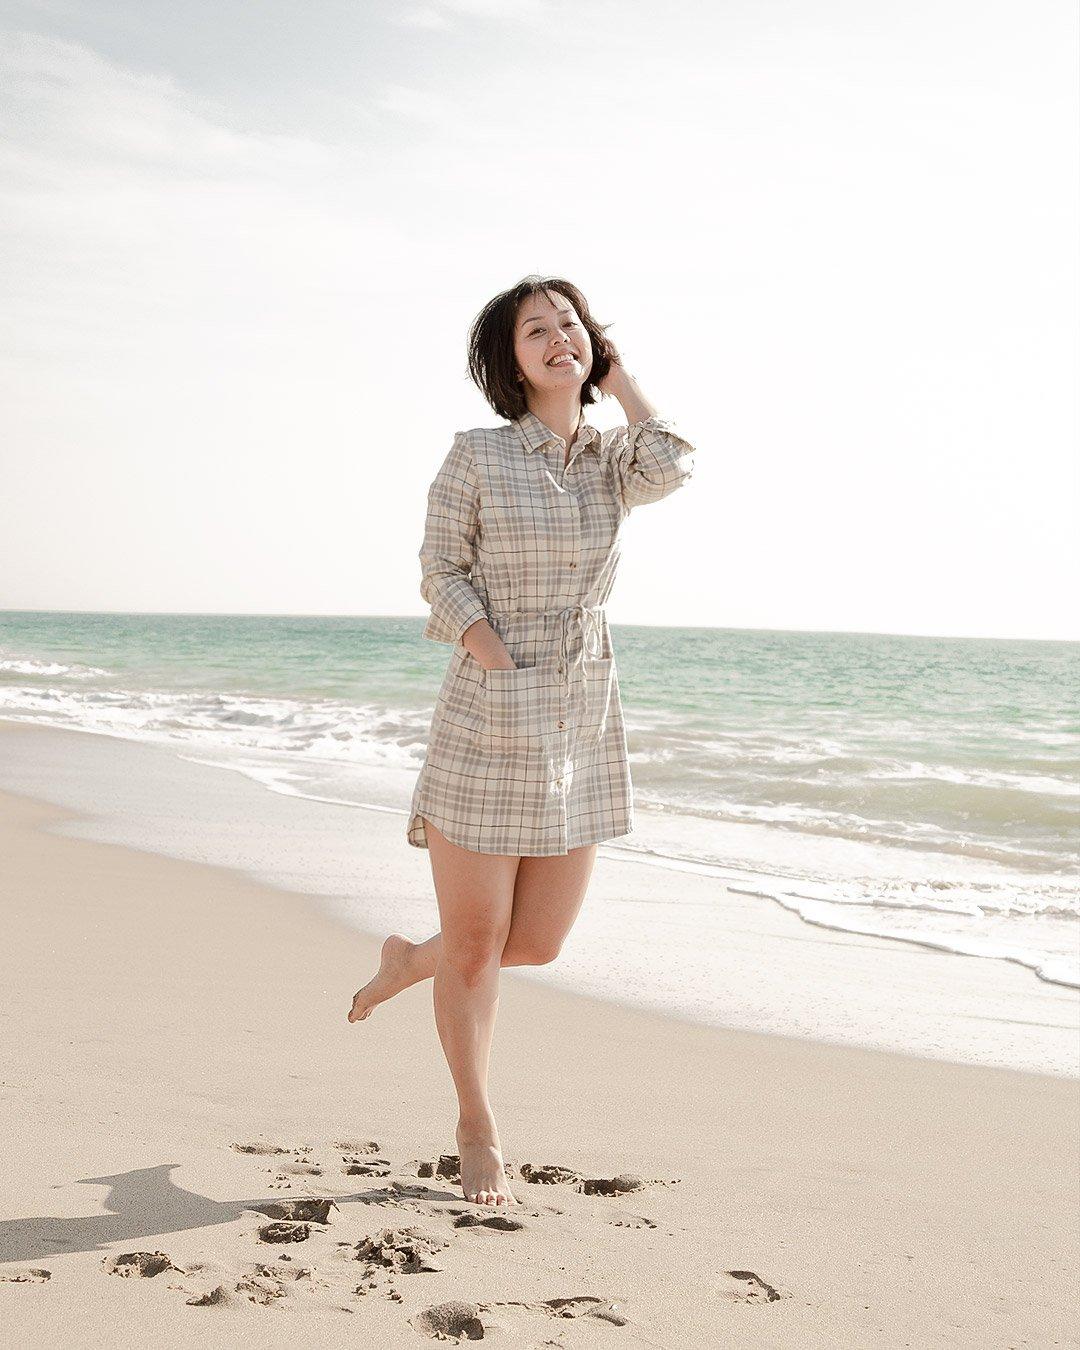 mental health self-esteem Serein Wu